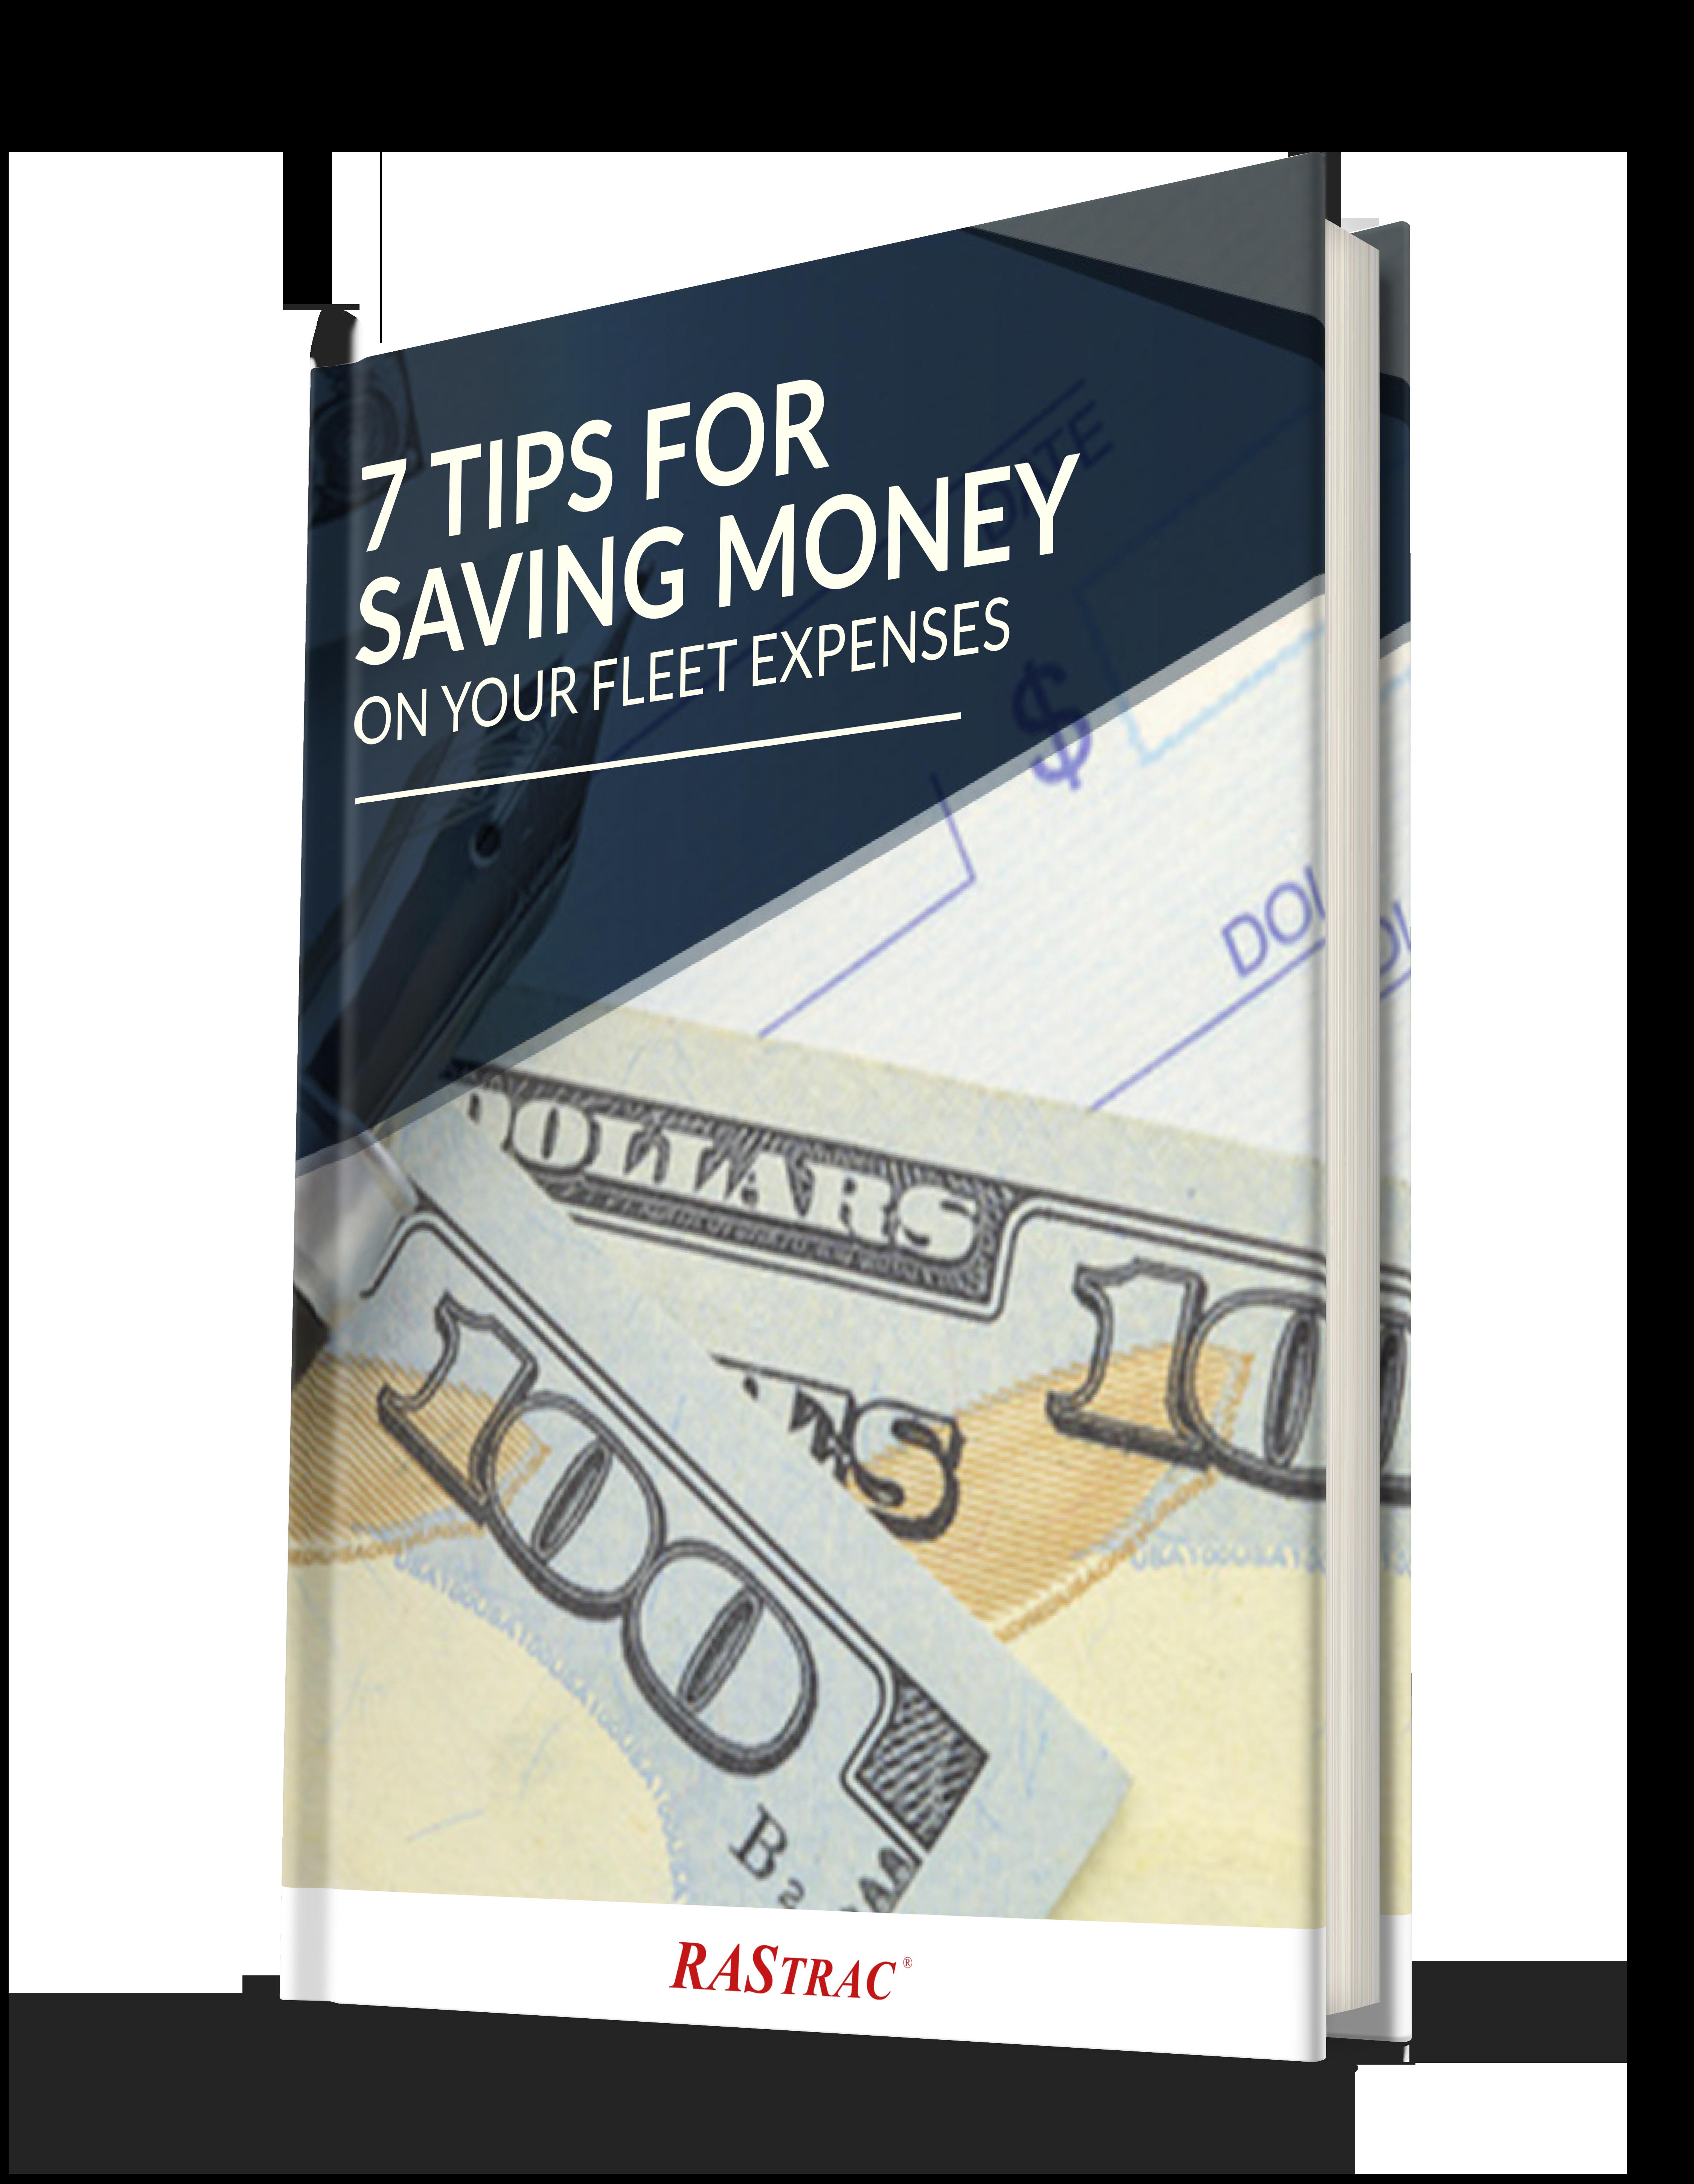 7 Tips for Saving Money on Your Fleet Expenses